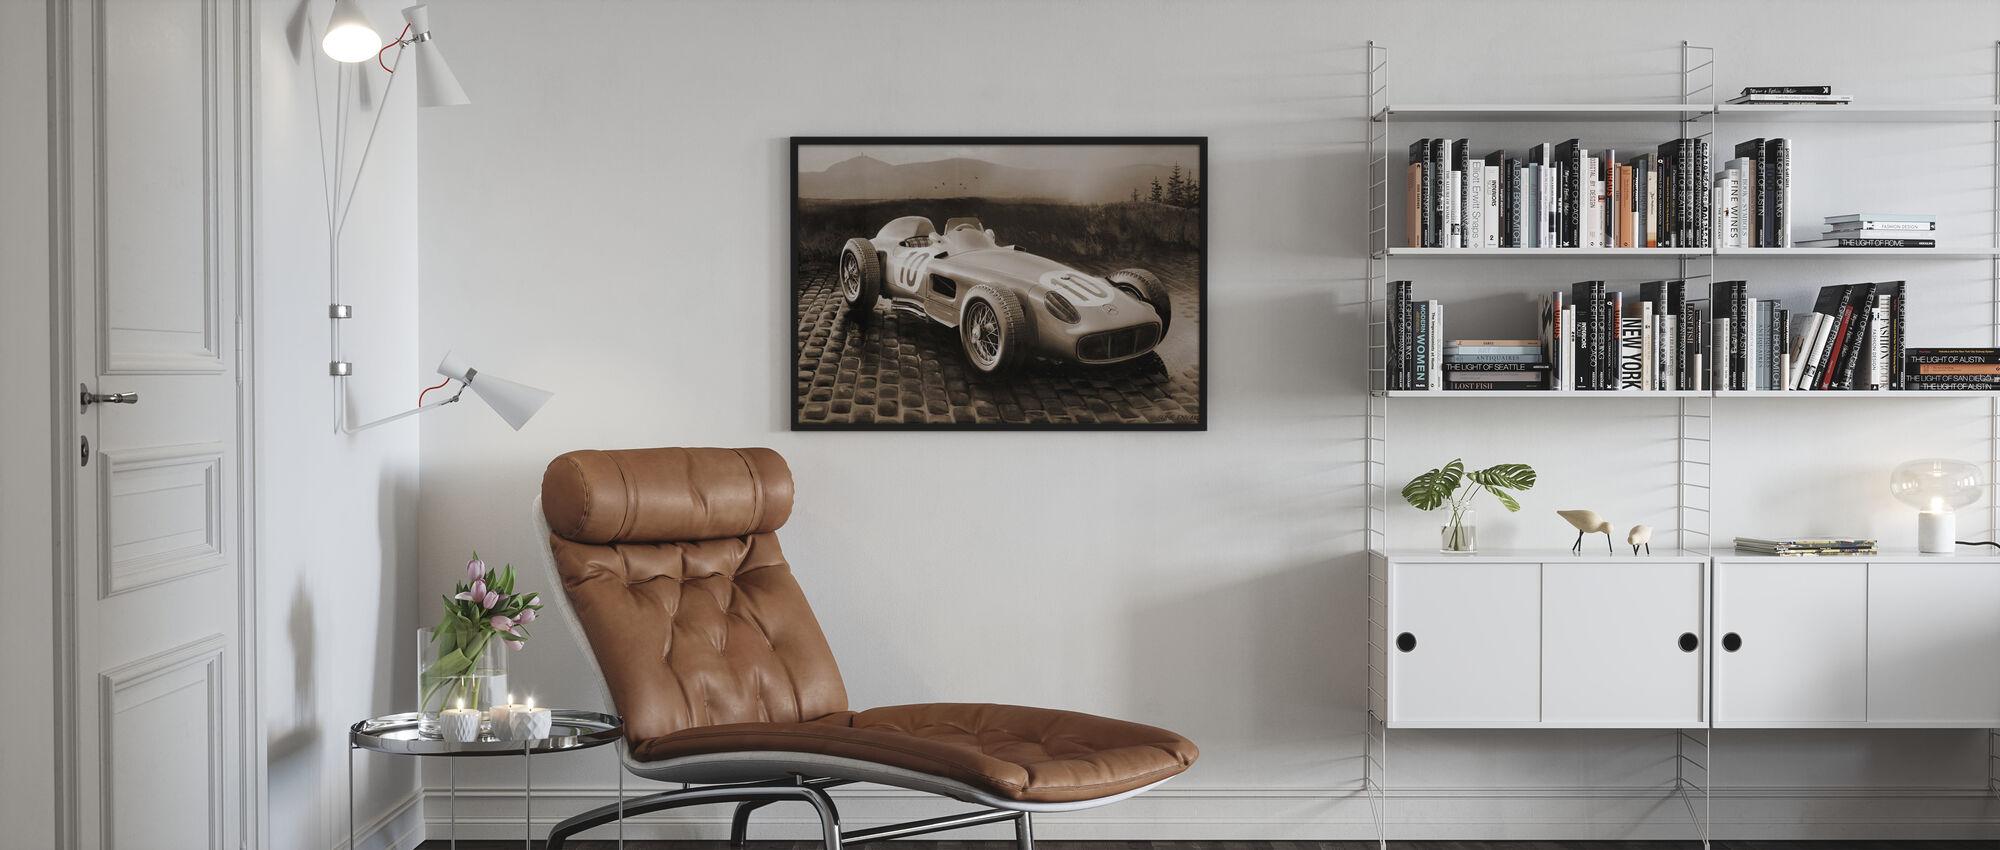 Car 1954 Sepia - Framed print - Living Room